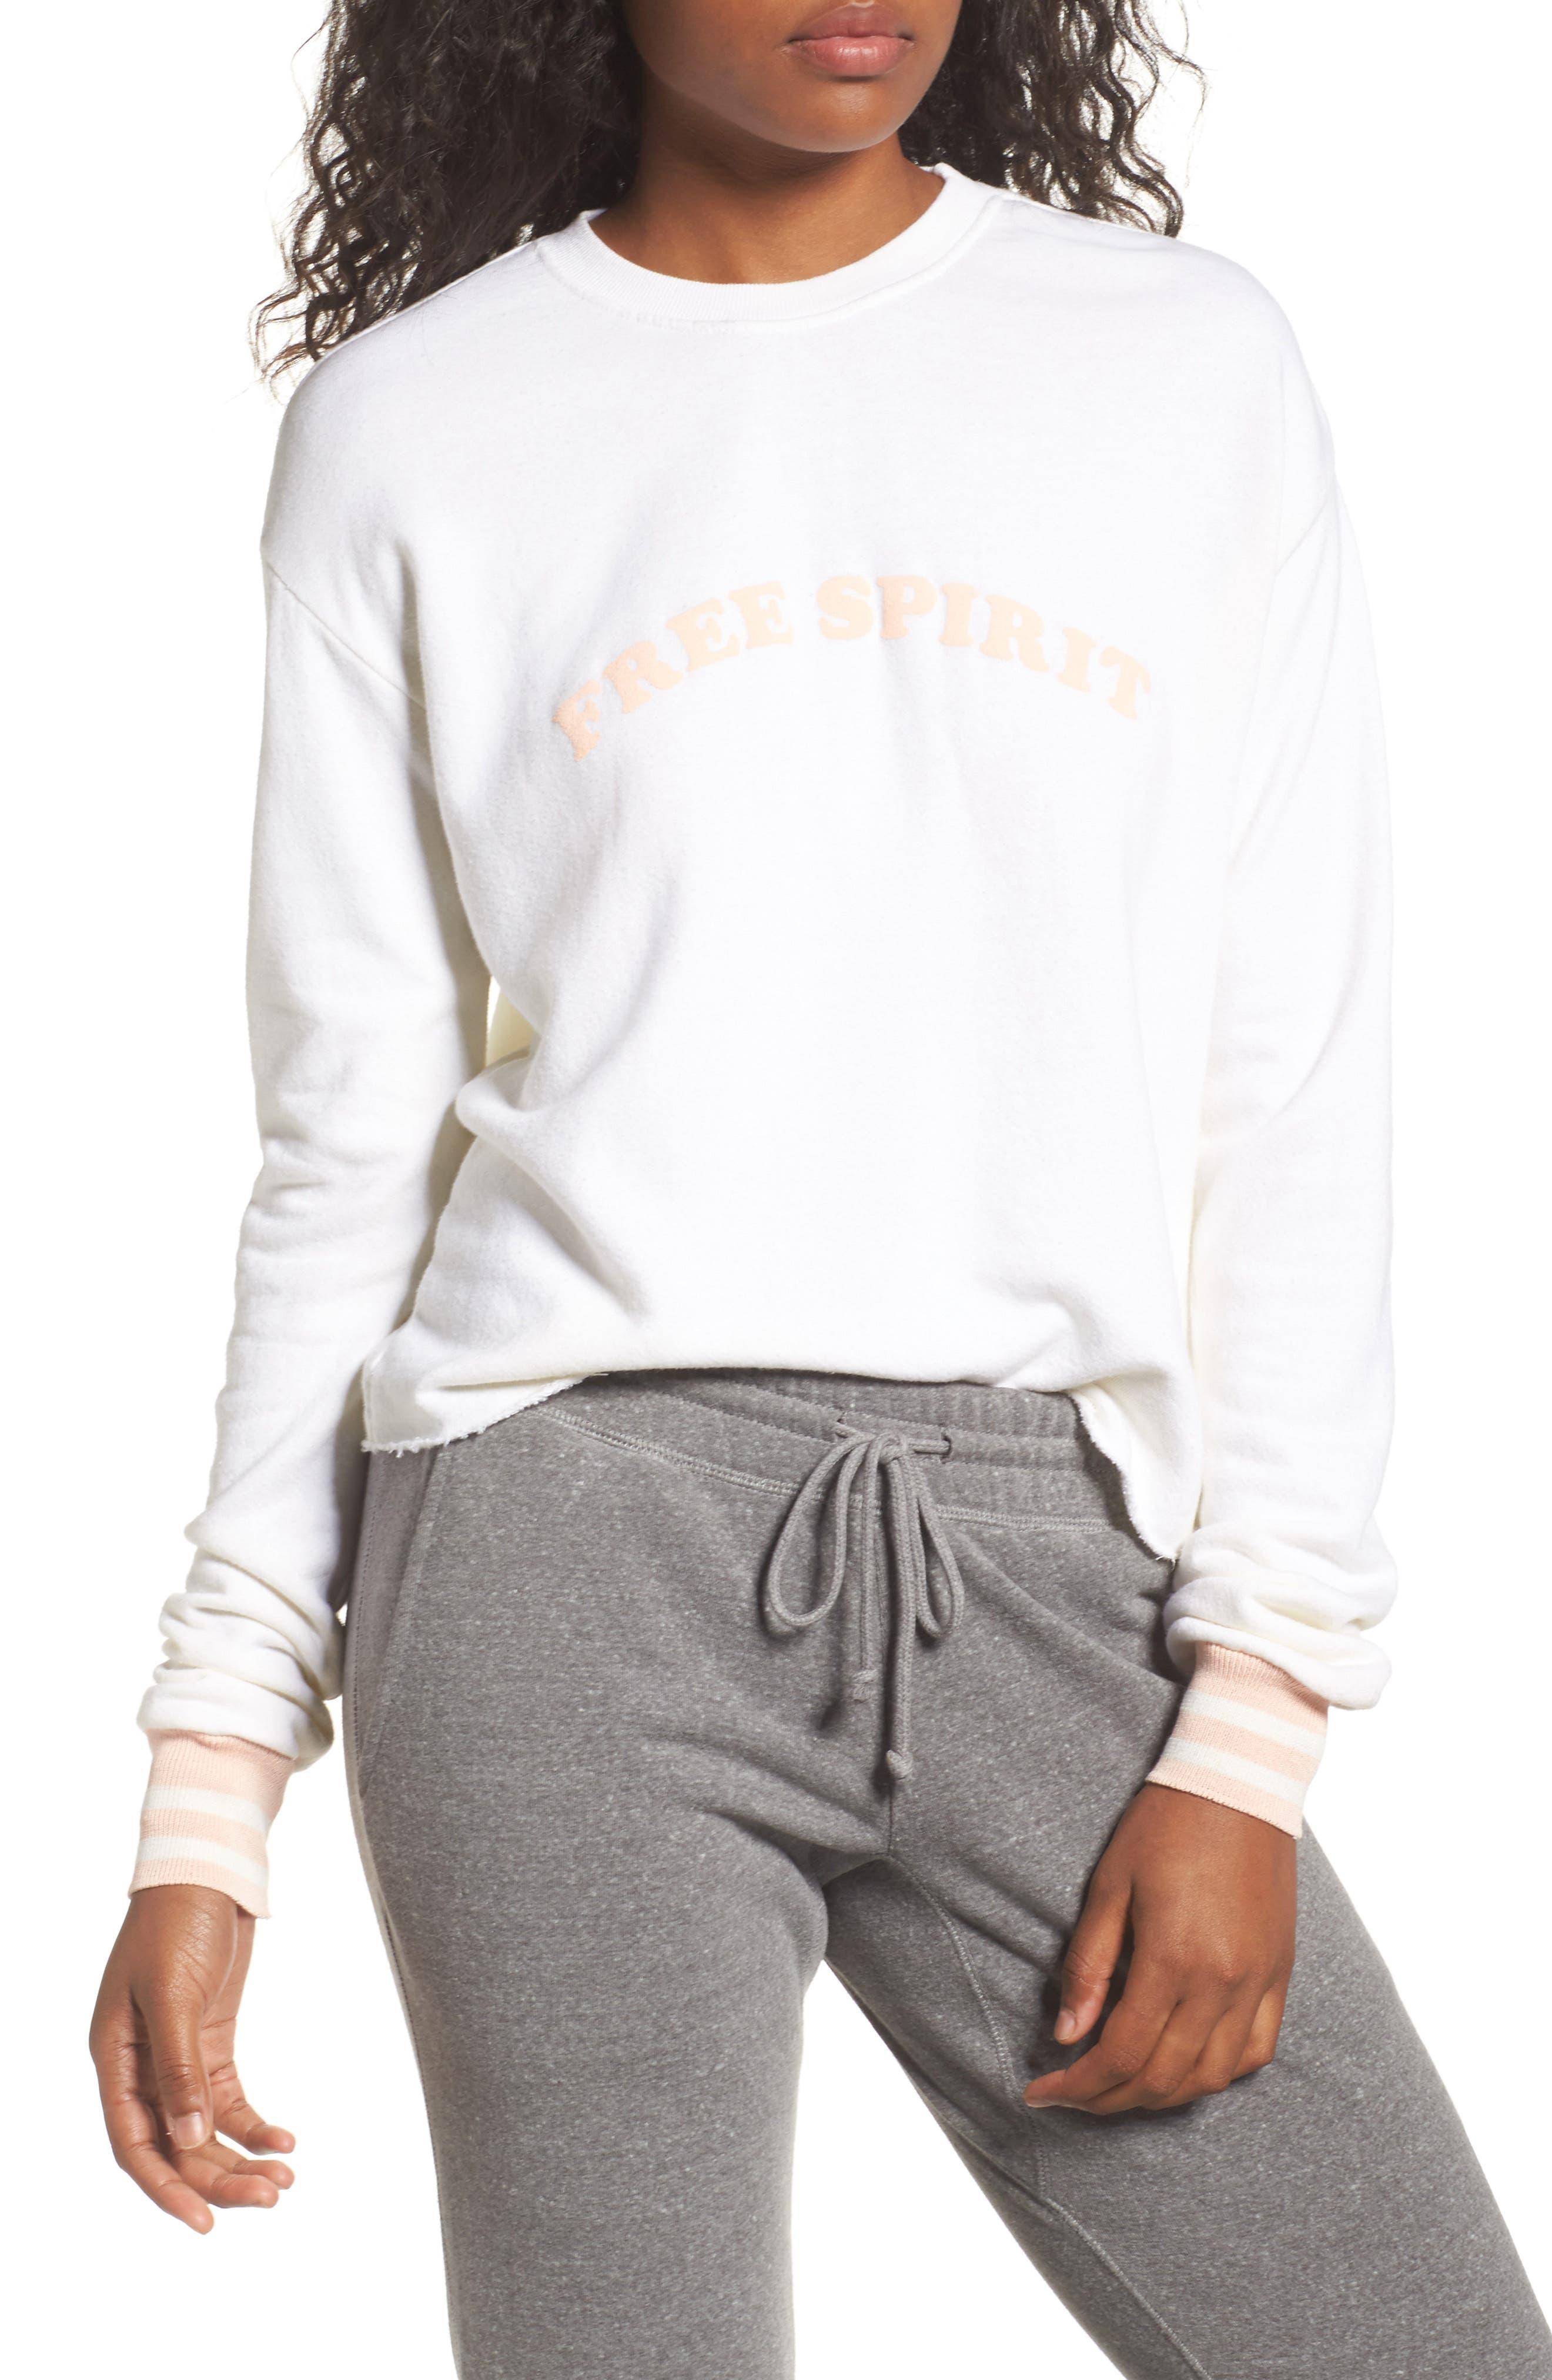 Free Spirit Crop Sweatshirt,                         Main,                         color, 114